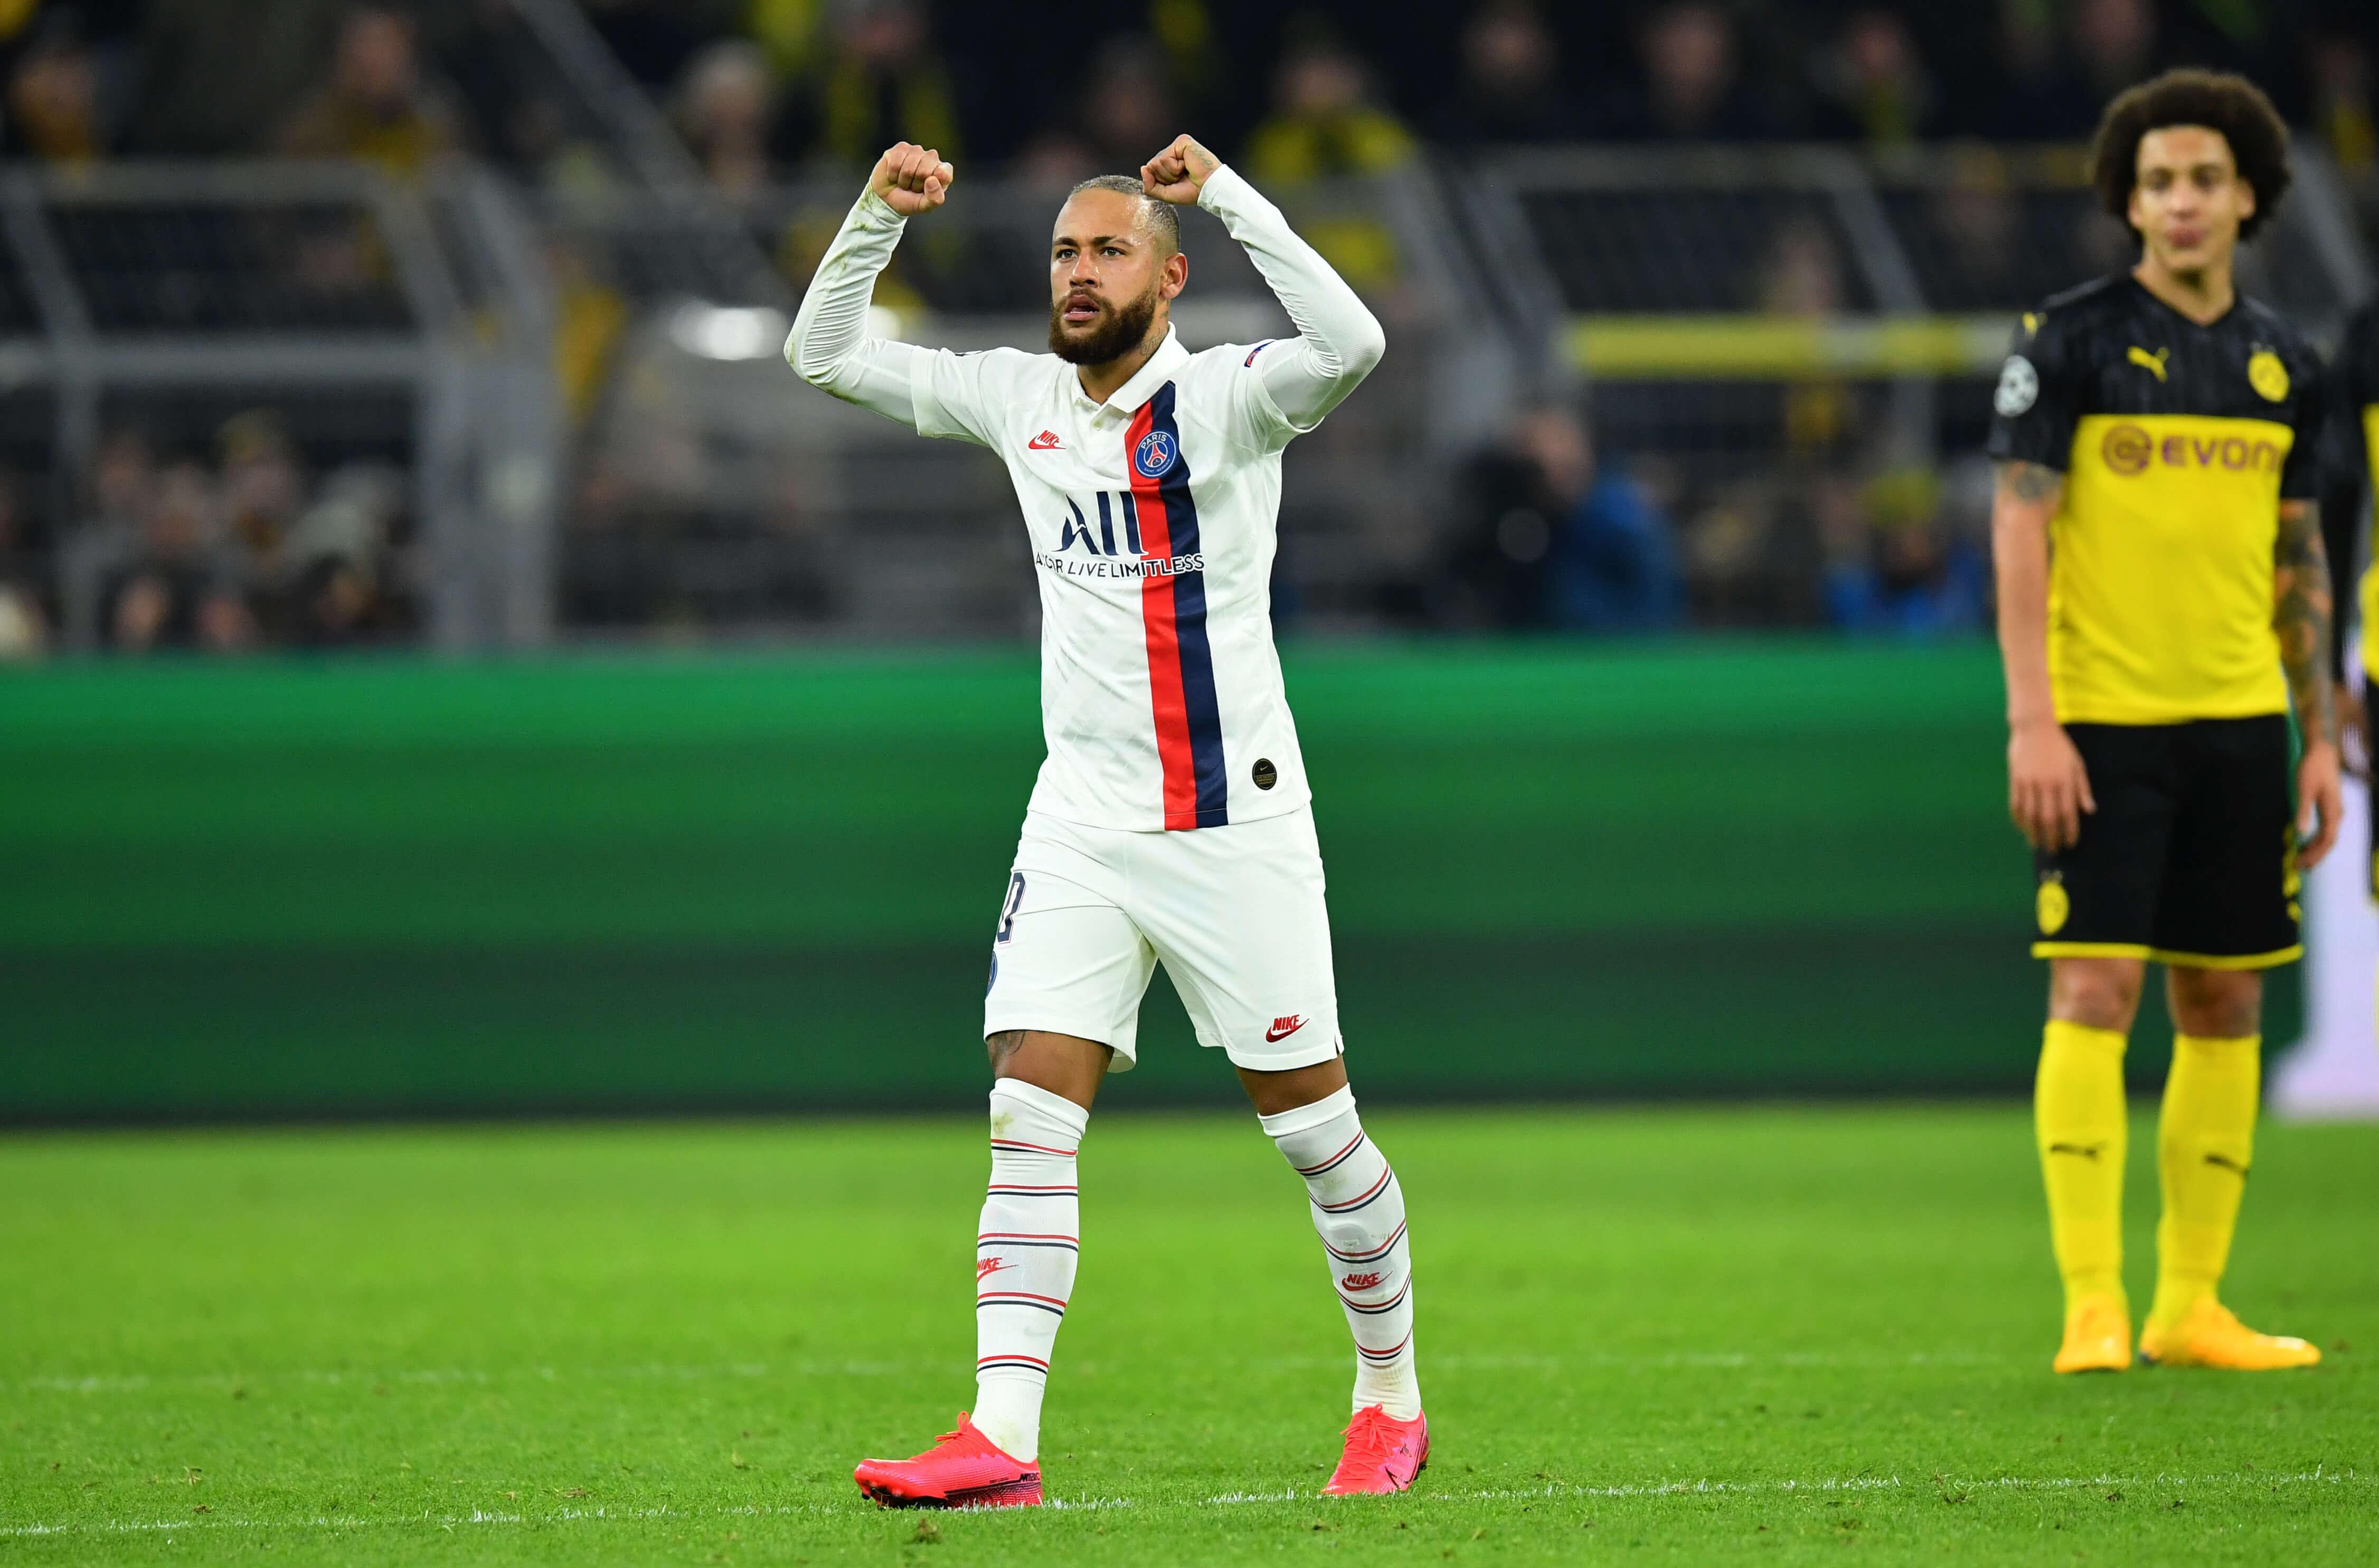 Borussia Dortmung Paris Saint Germain Haaland Neymar Emre Can